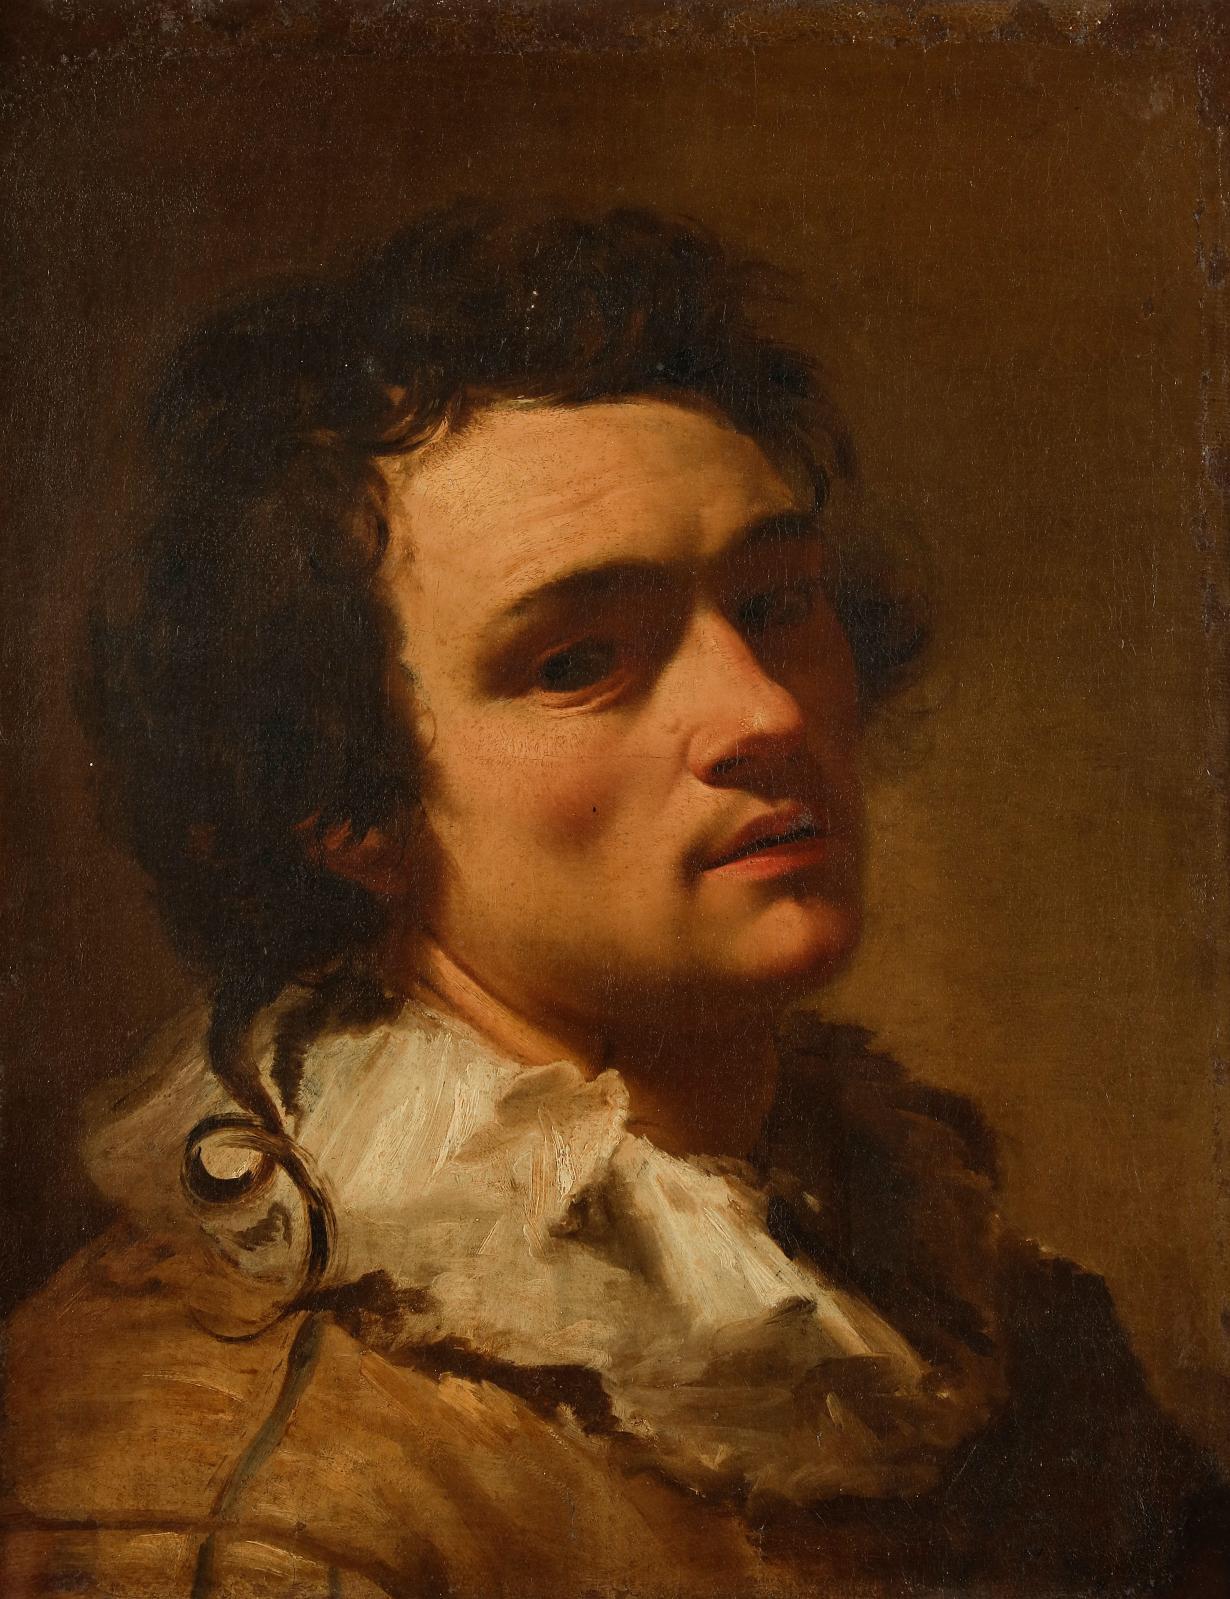 Henri Traivoel (active in Rome in 1622), Presumed self-portrait, oil on canvas, 50.5 x 40.5 cm.Result: €256,000